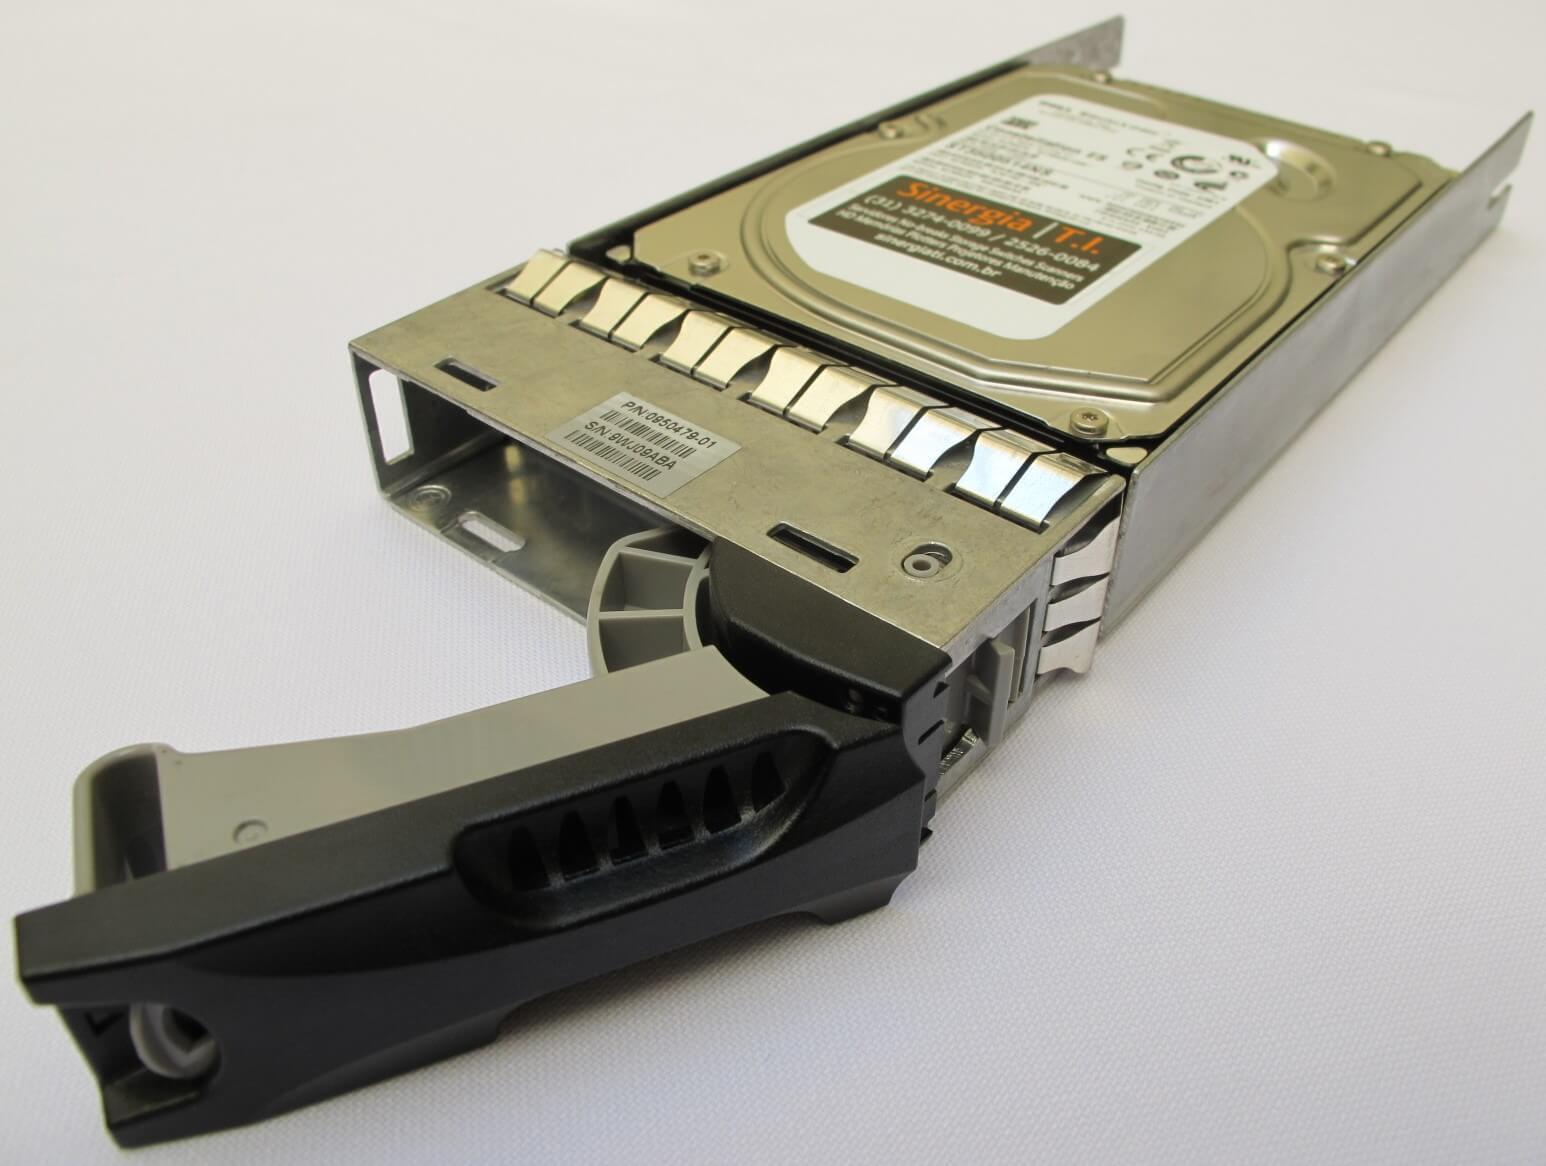 HDD 500GB SATA-2 Dell EqualLogic 7.2K PN: 9JW152-536 e ST3500514NS foto com gaveta aberta